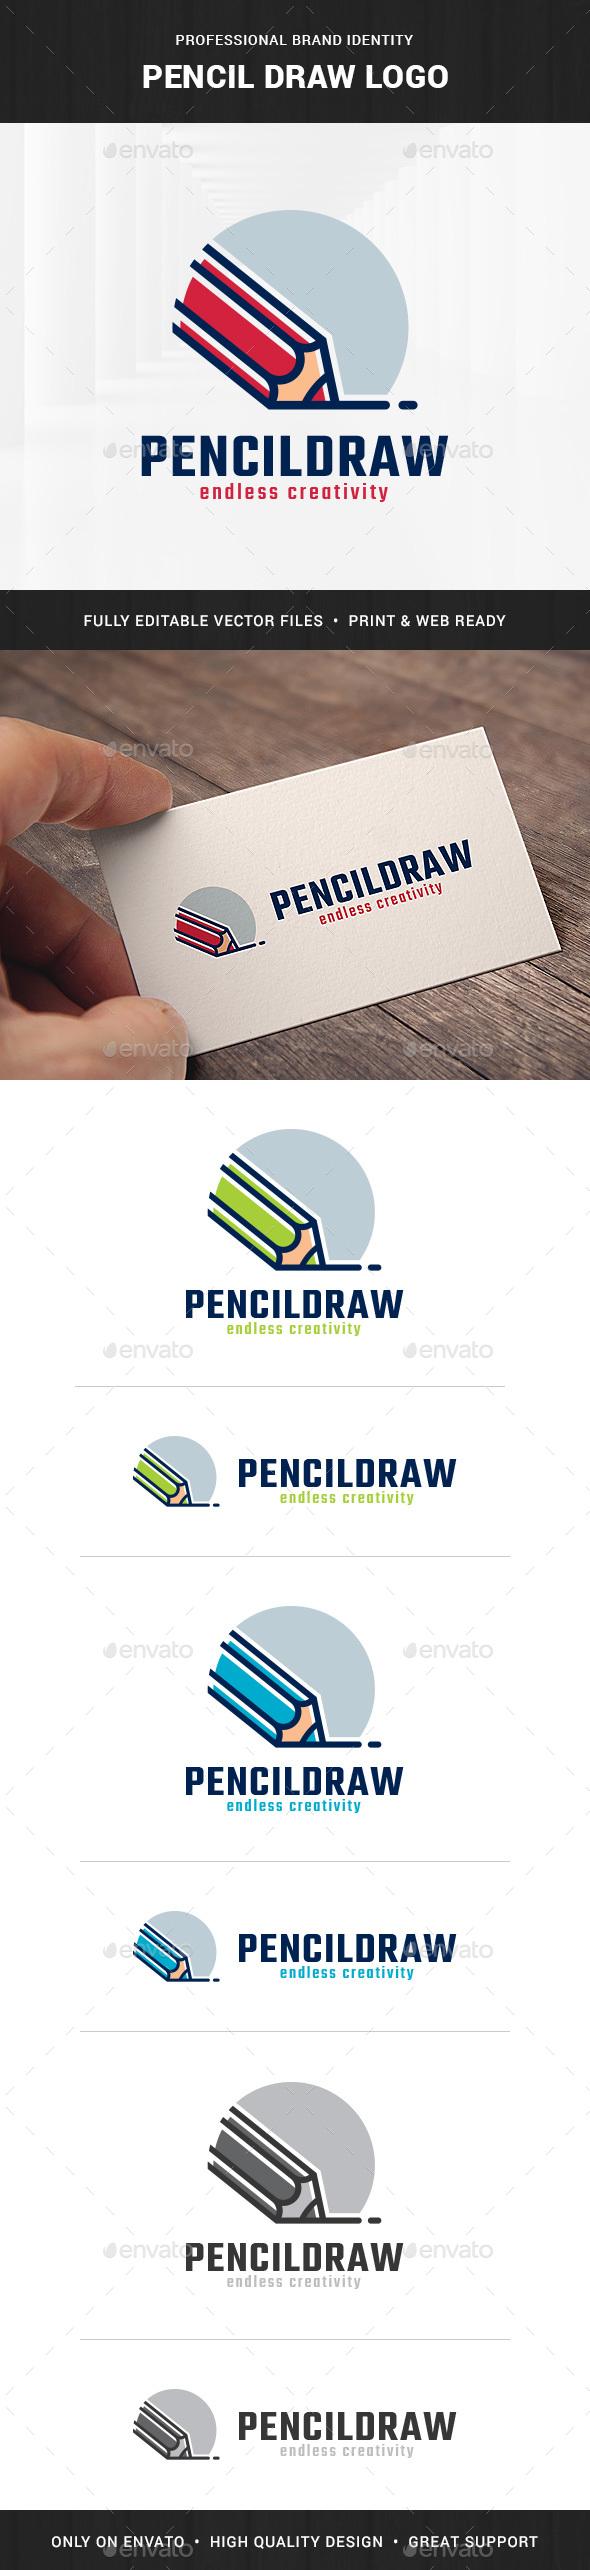 Pencil Draw Logo Template